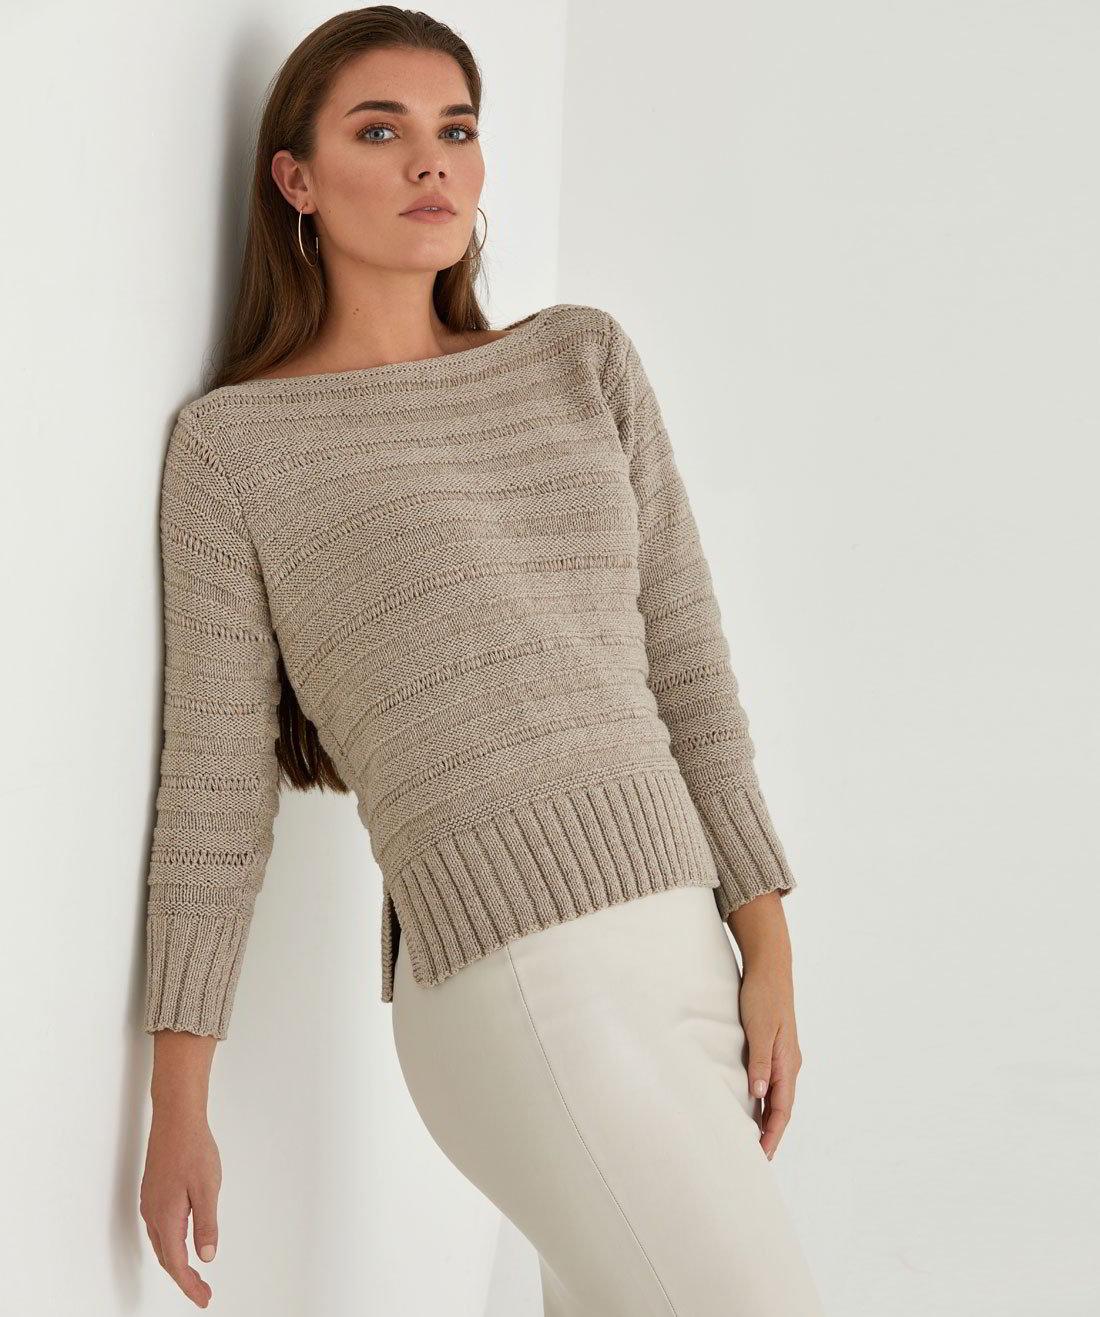 ab382582281a Женский пуловер спицами Sandy - Вяжи.ру